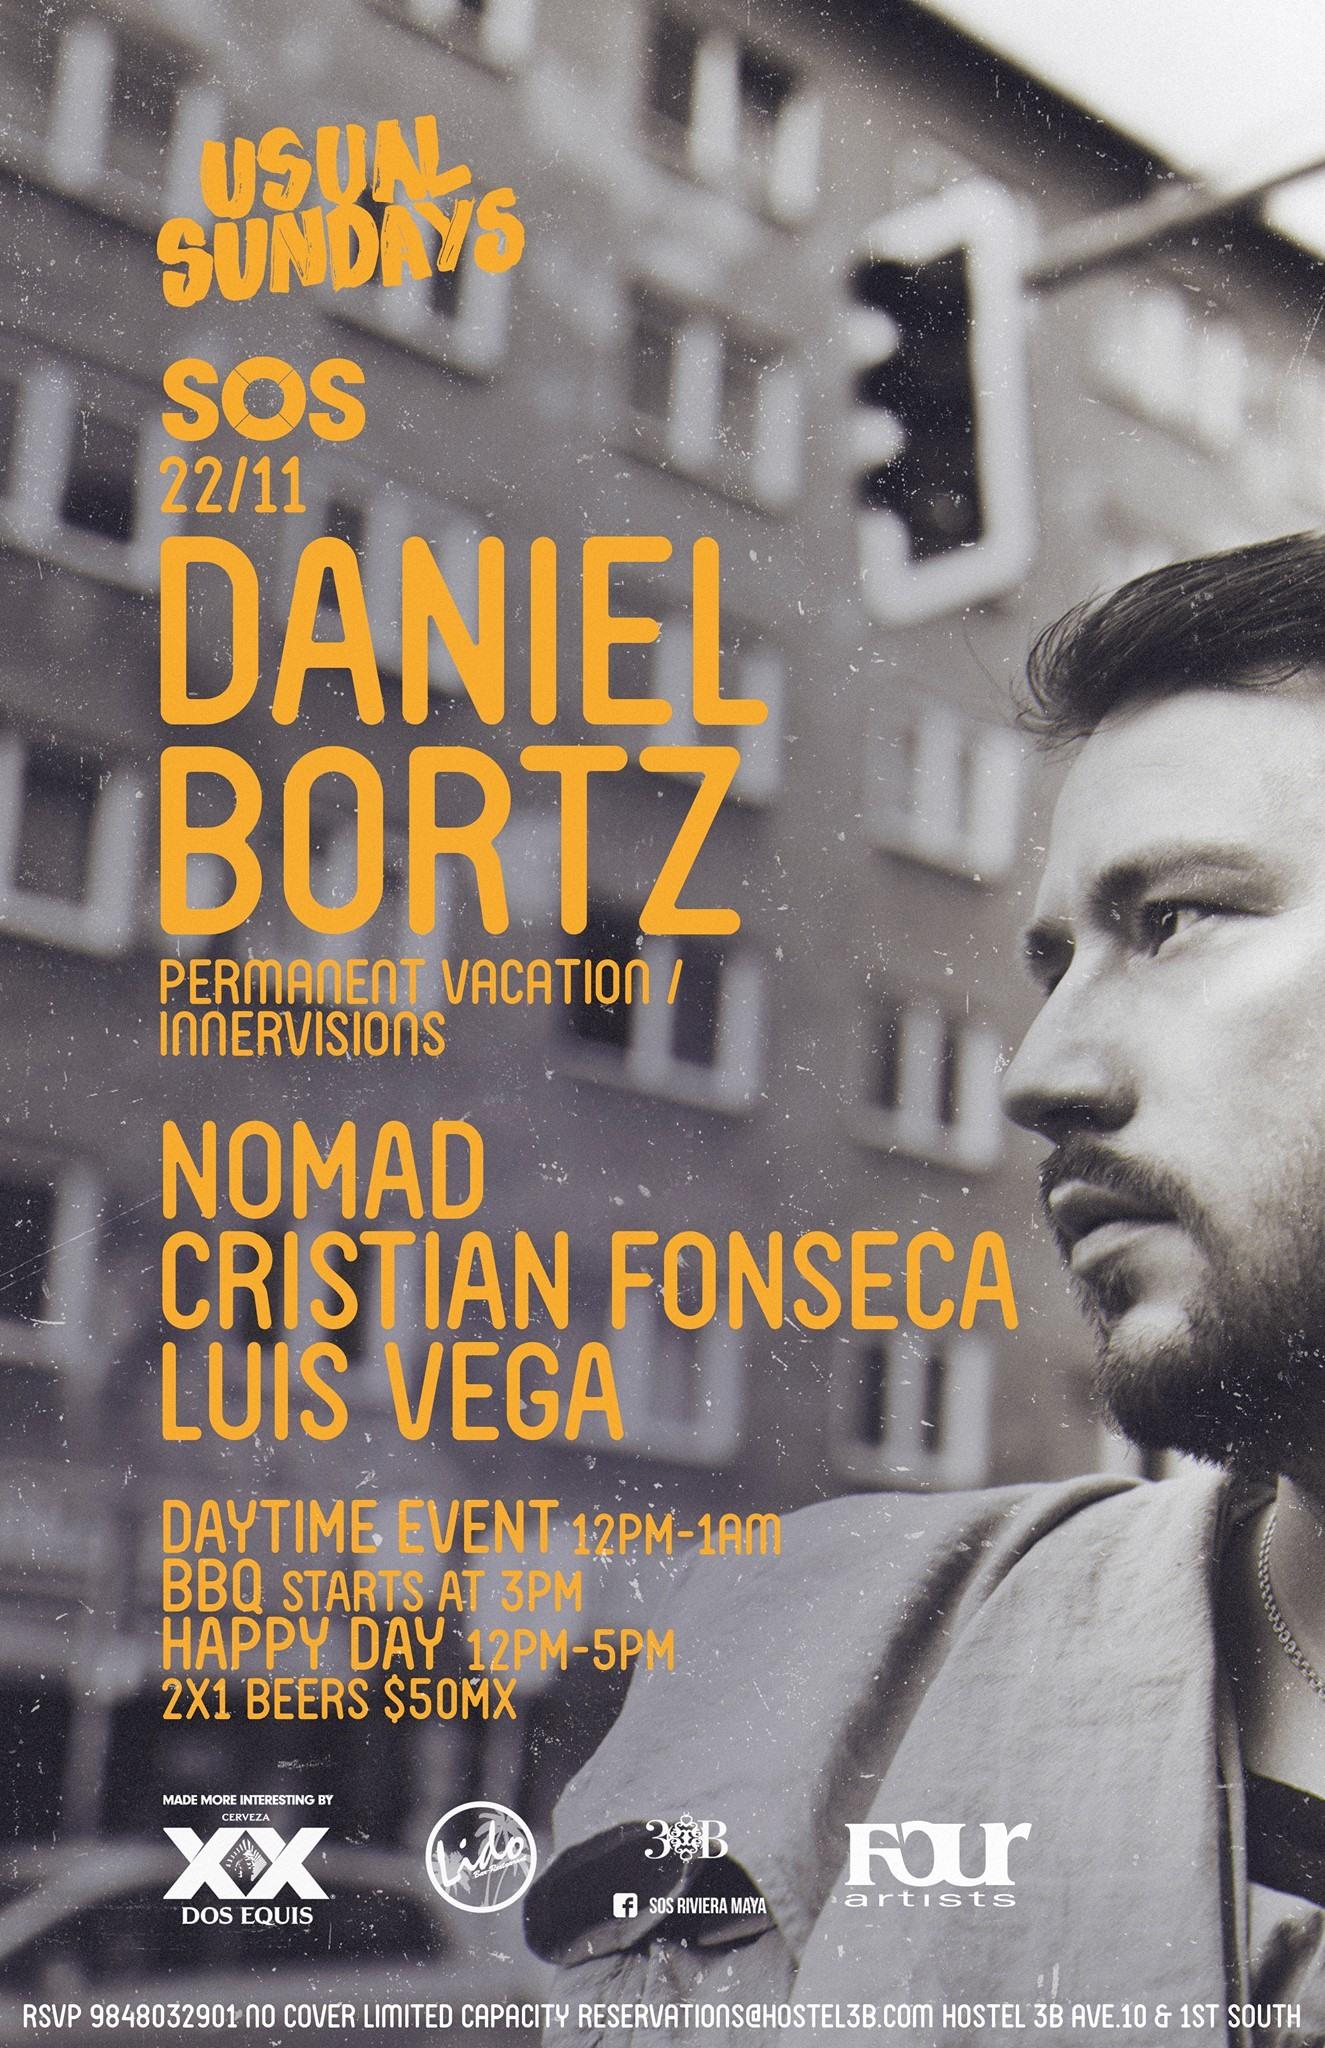 Daniel Bortz @ SOS Lounge Playa del Carmen